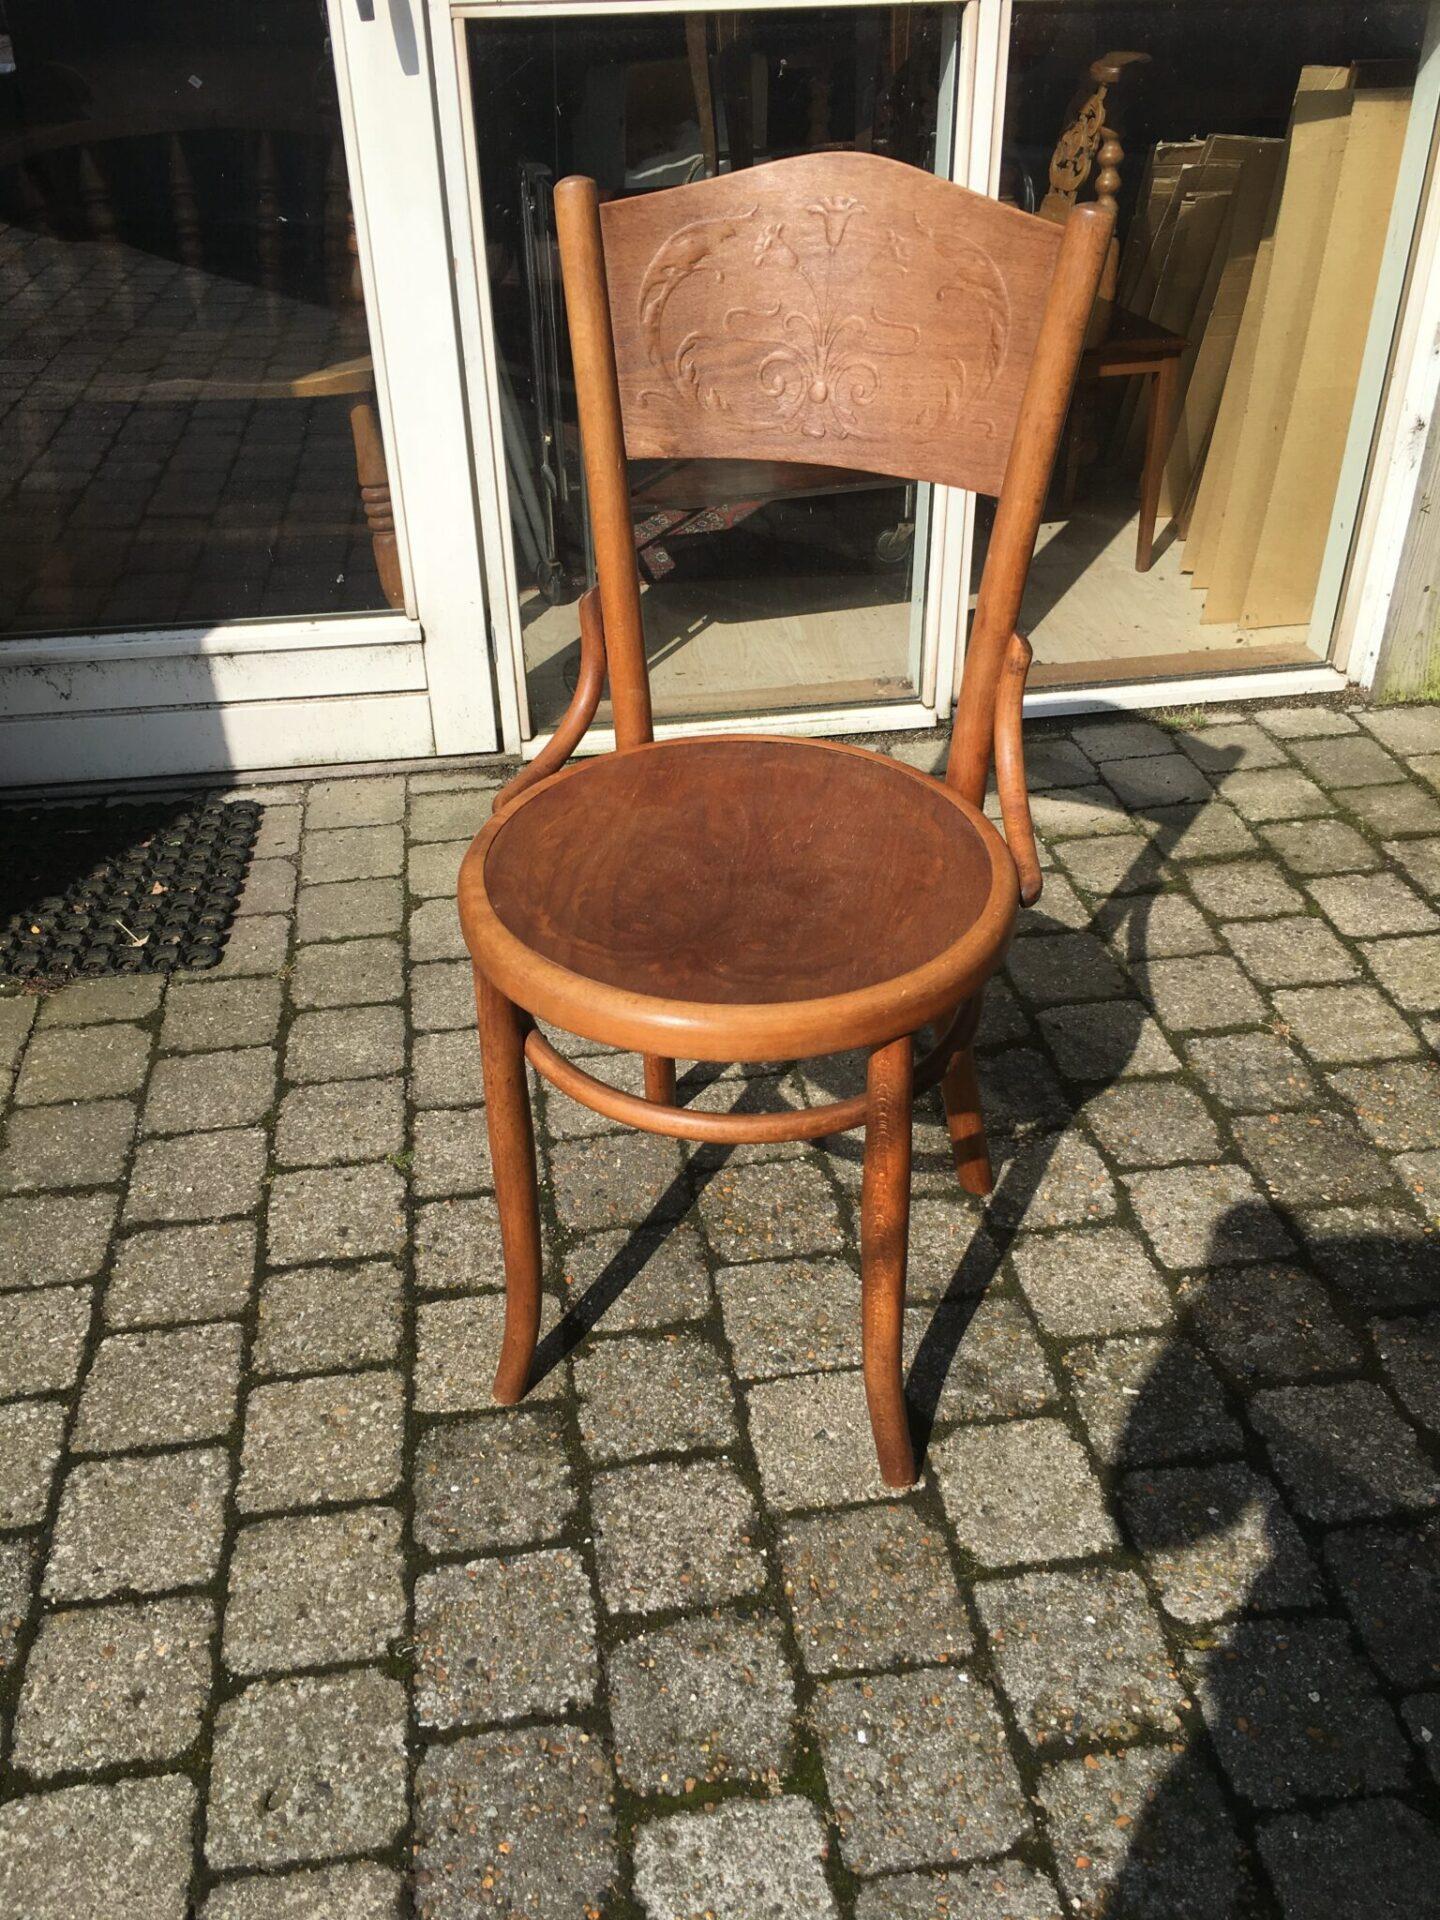 1 stk Thonet stol, pris 200 kr